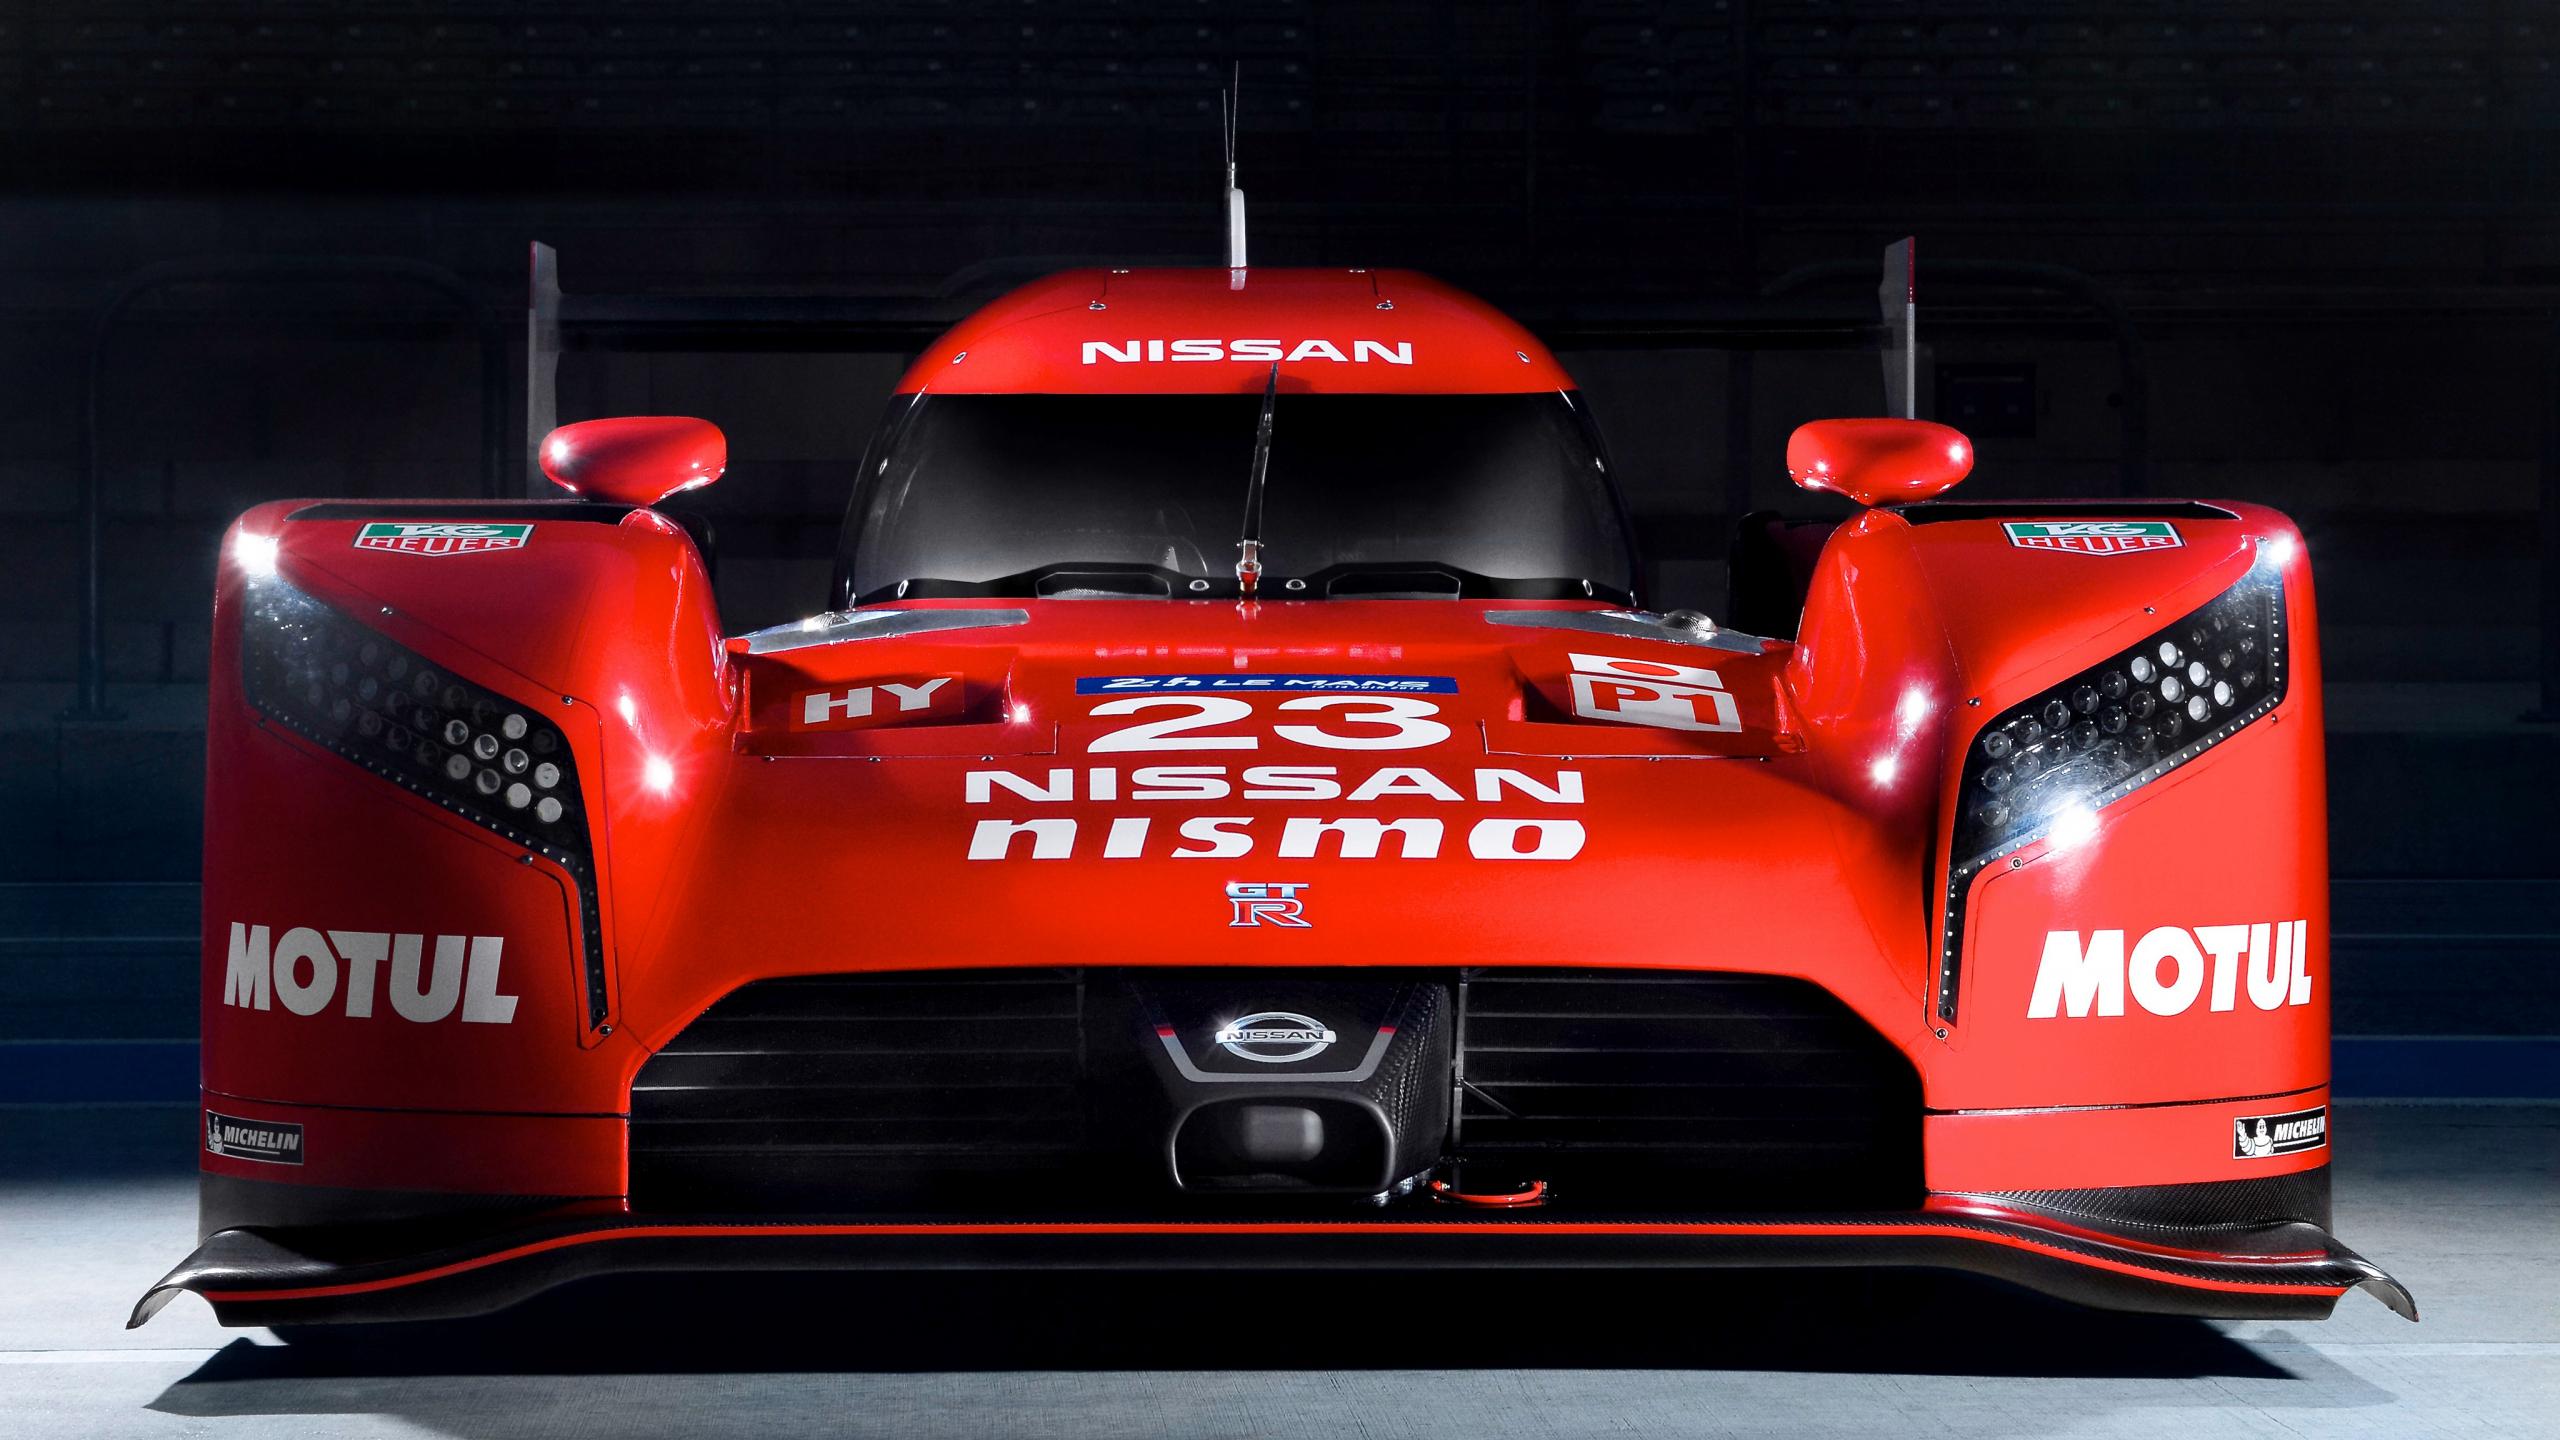 2560x1440 wallpaper Nissan GT-R LM Nismo prototype racing car